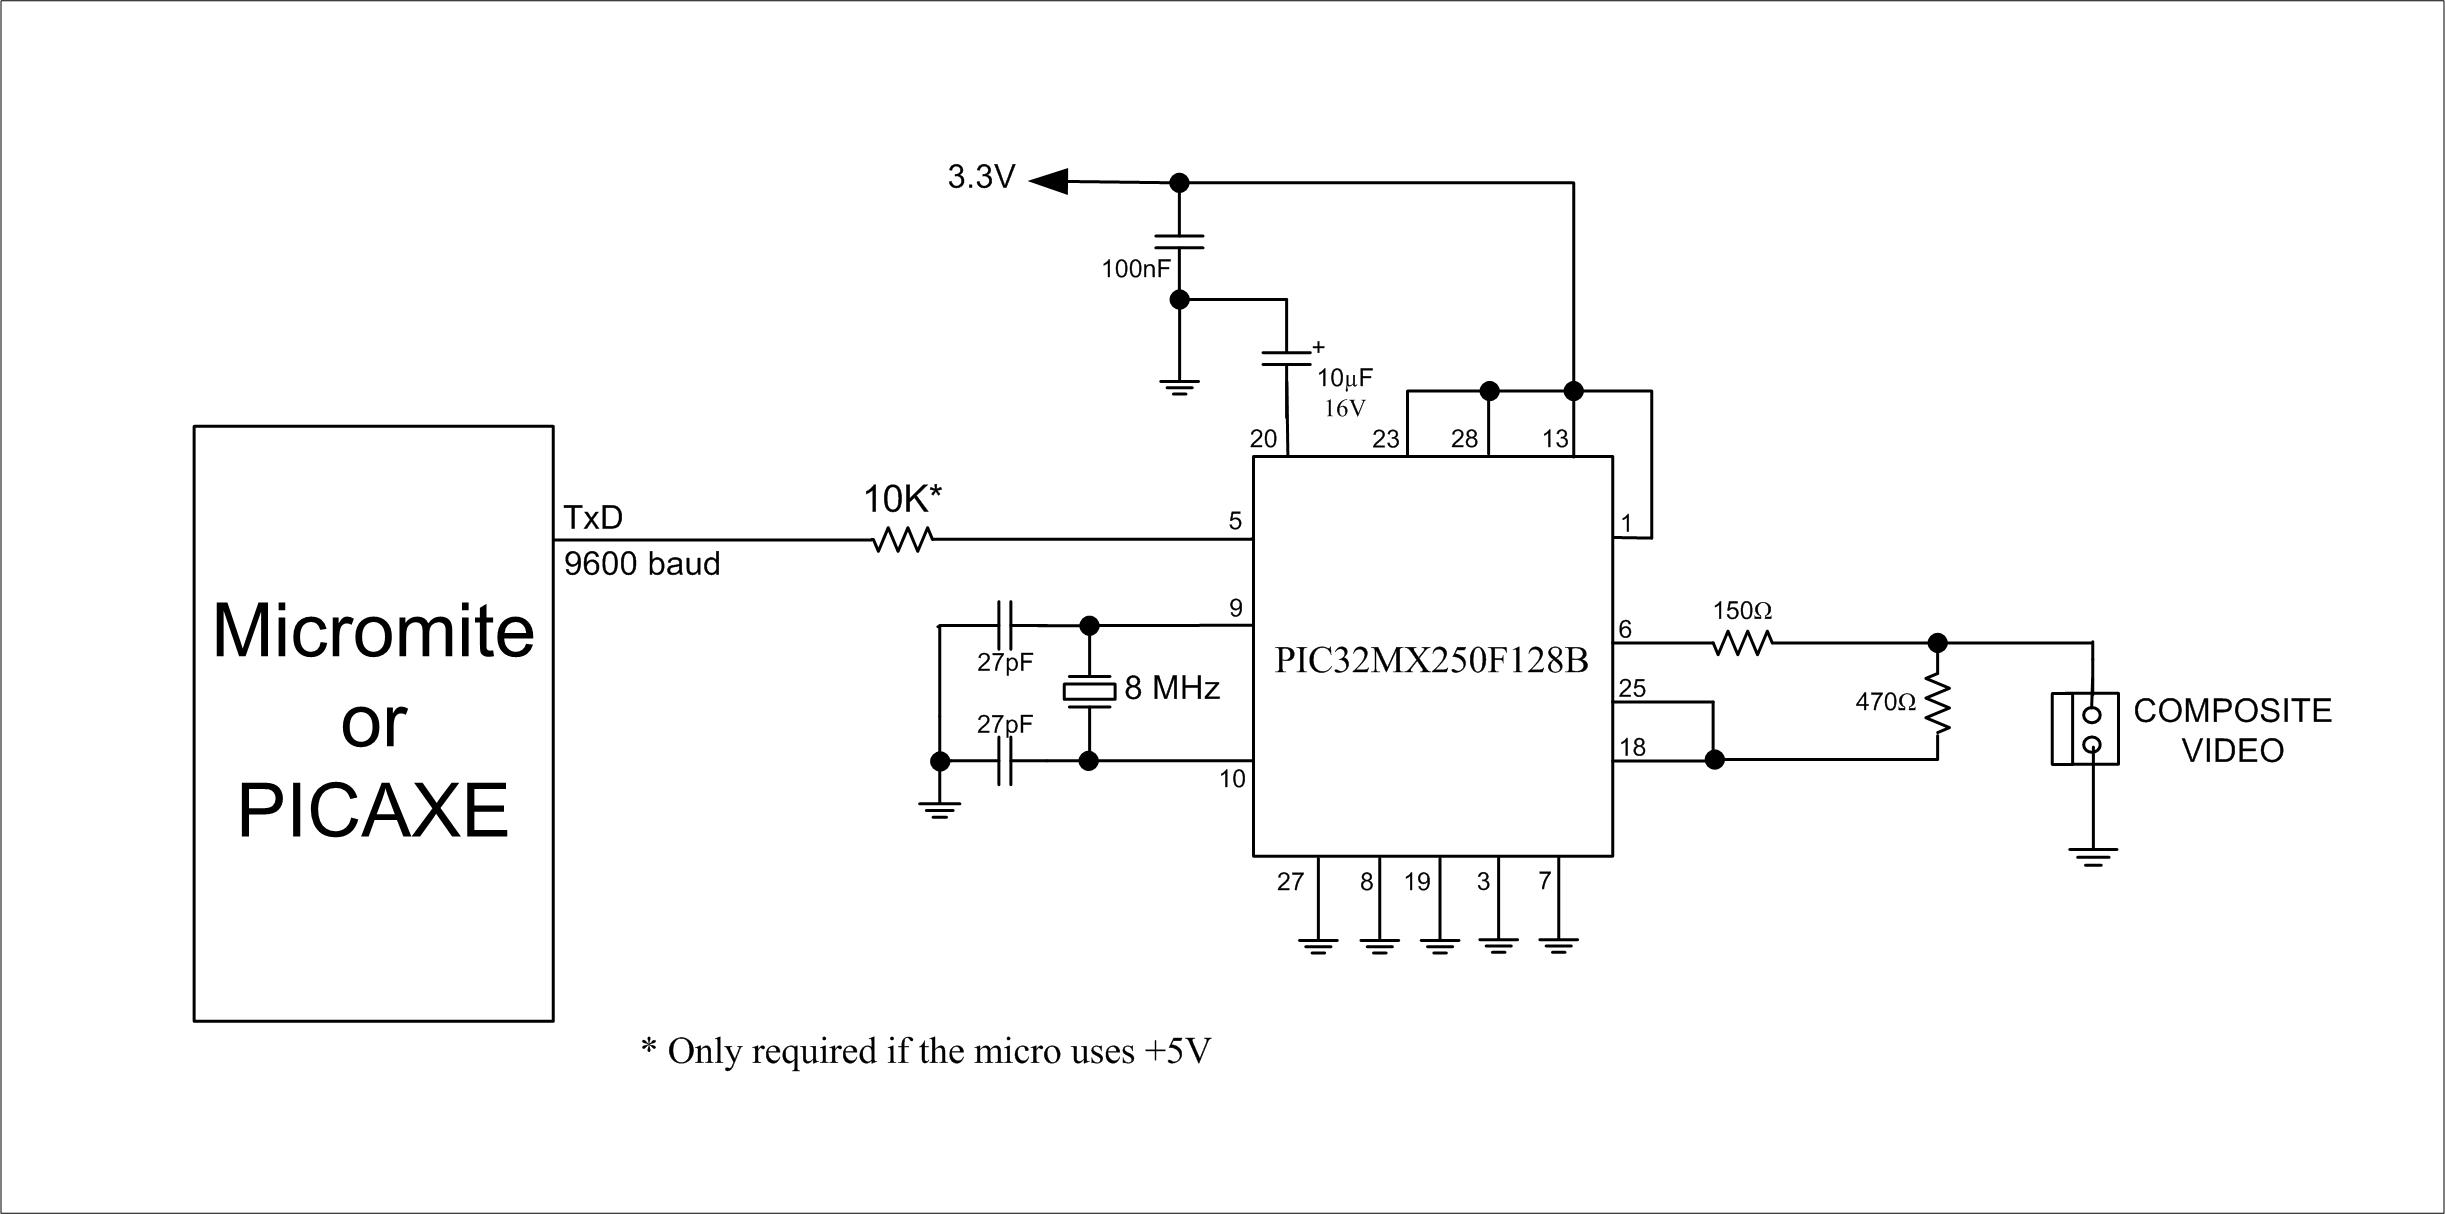 Simple Tv Audio Video Transmitter Circuit Schematic